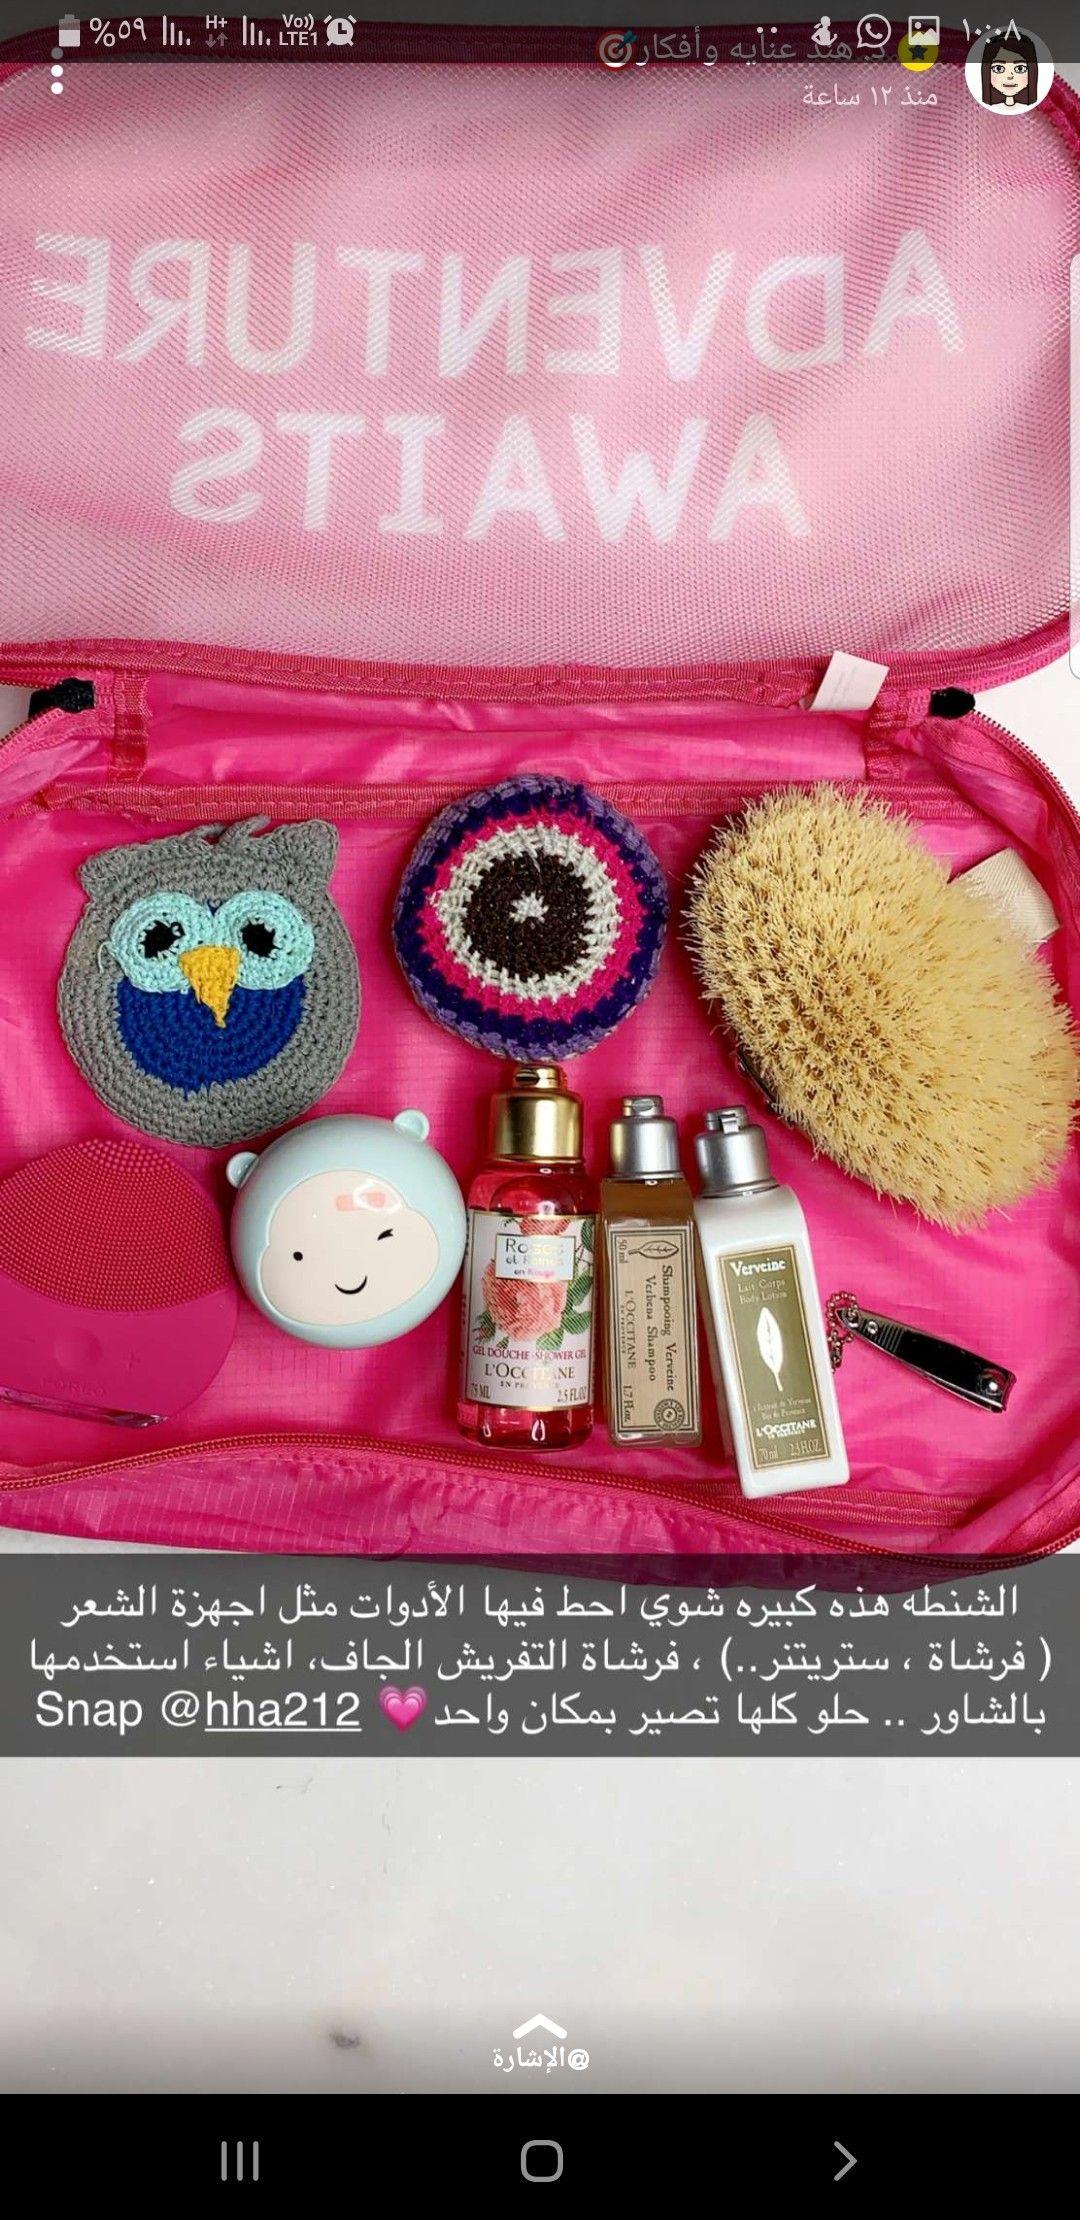 Pin By Alwarda Zhrany On نصائح Body Skin Care Beauty Care Body Skin